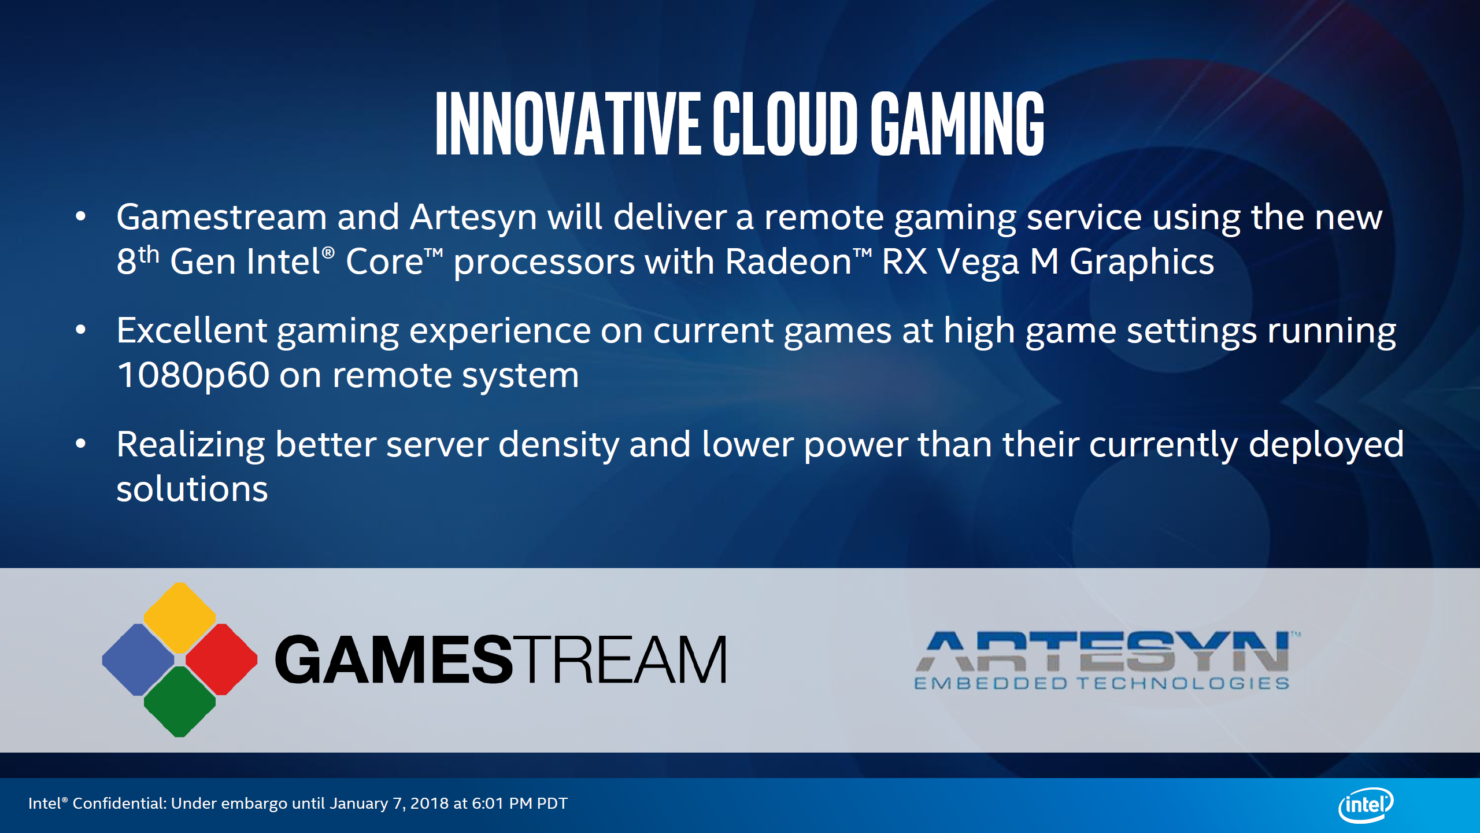 intel-8th-generation-core-processors-with-amd-radeon-rx-vega-m-graphics_24-2